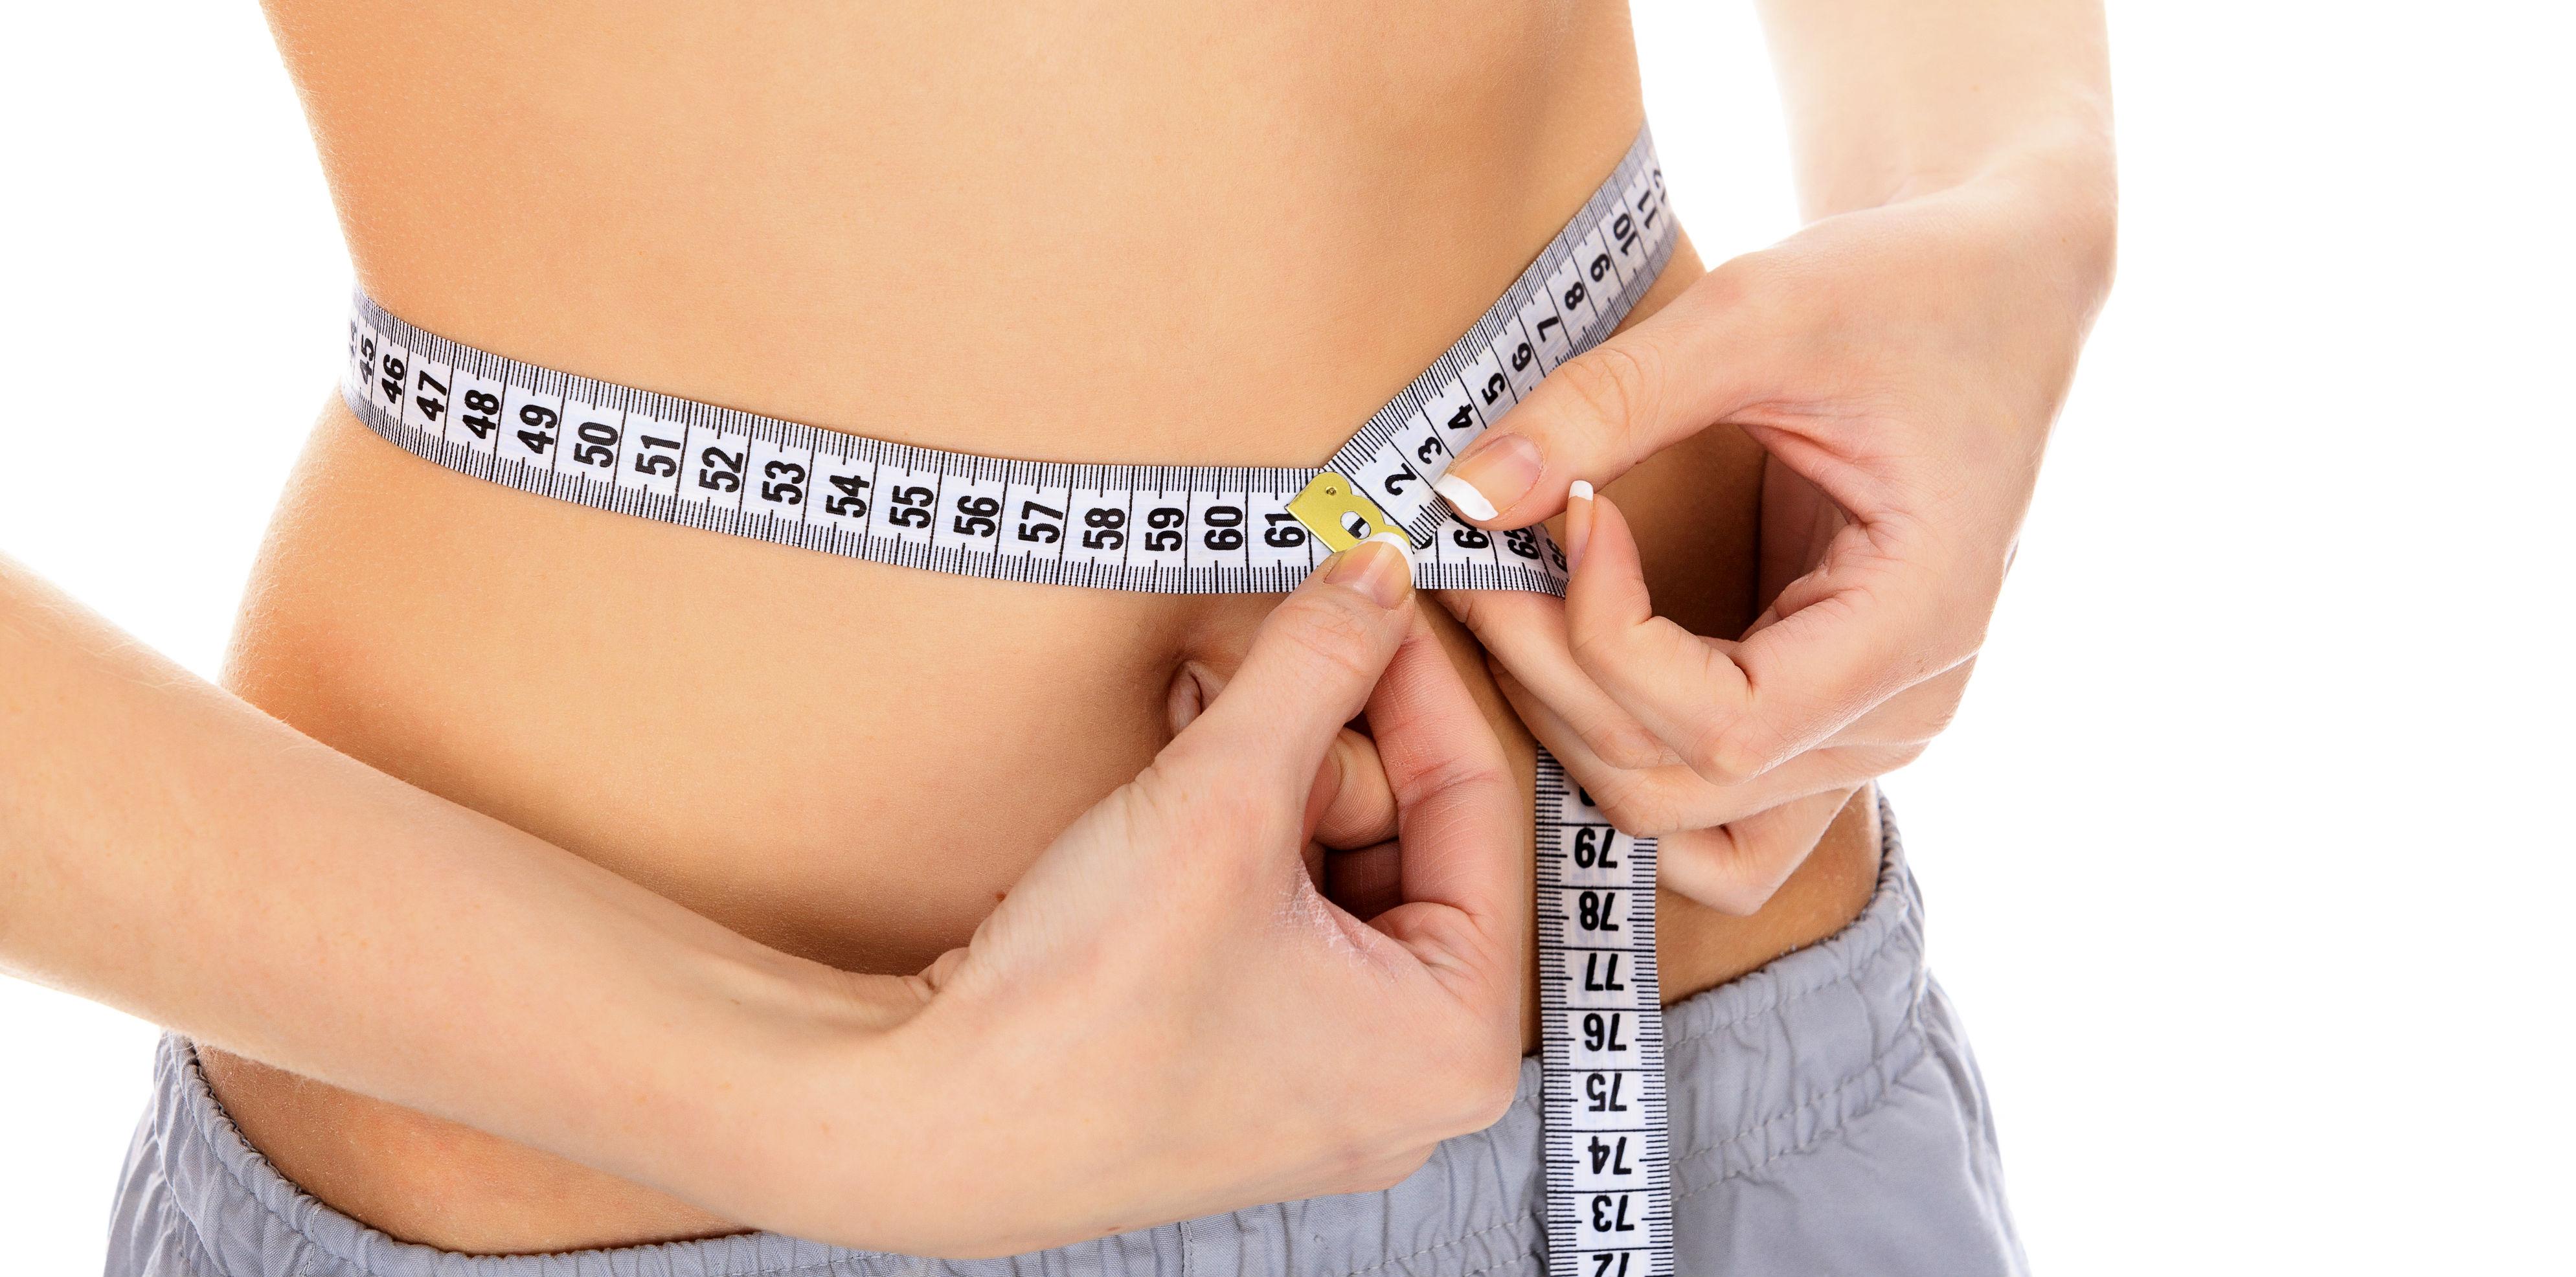 Få gode råd til vægttab